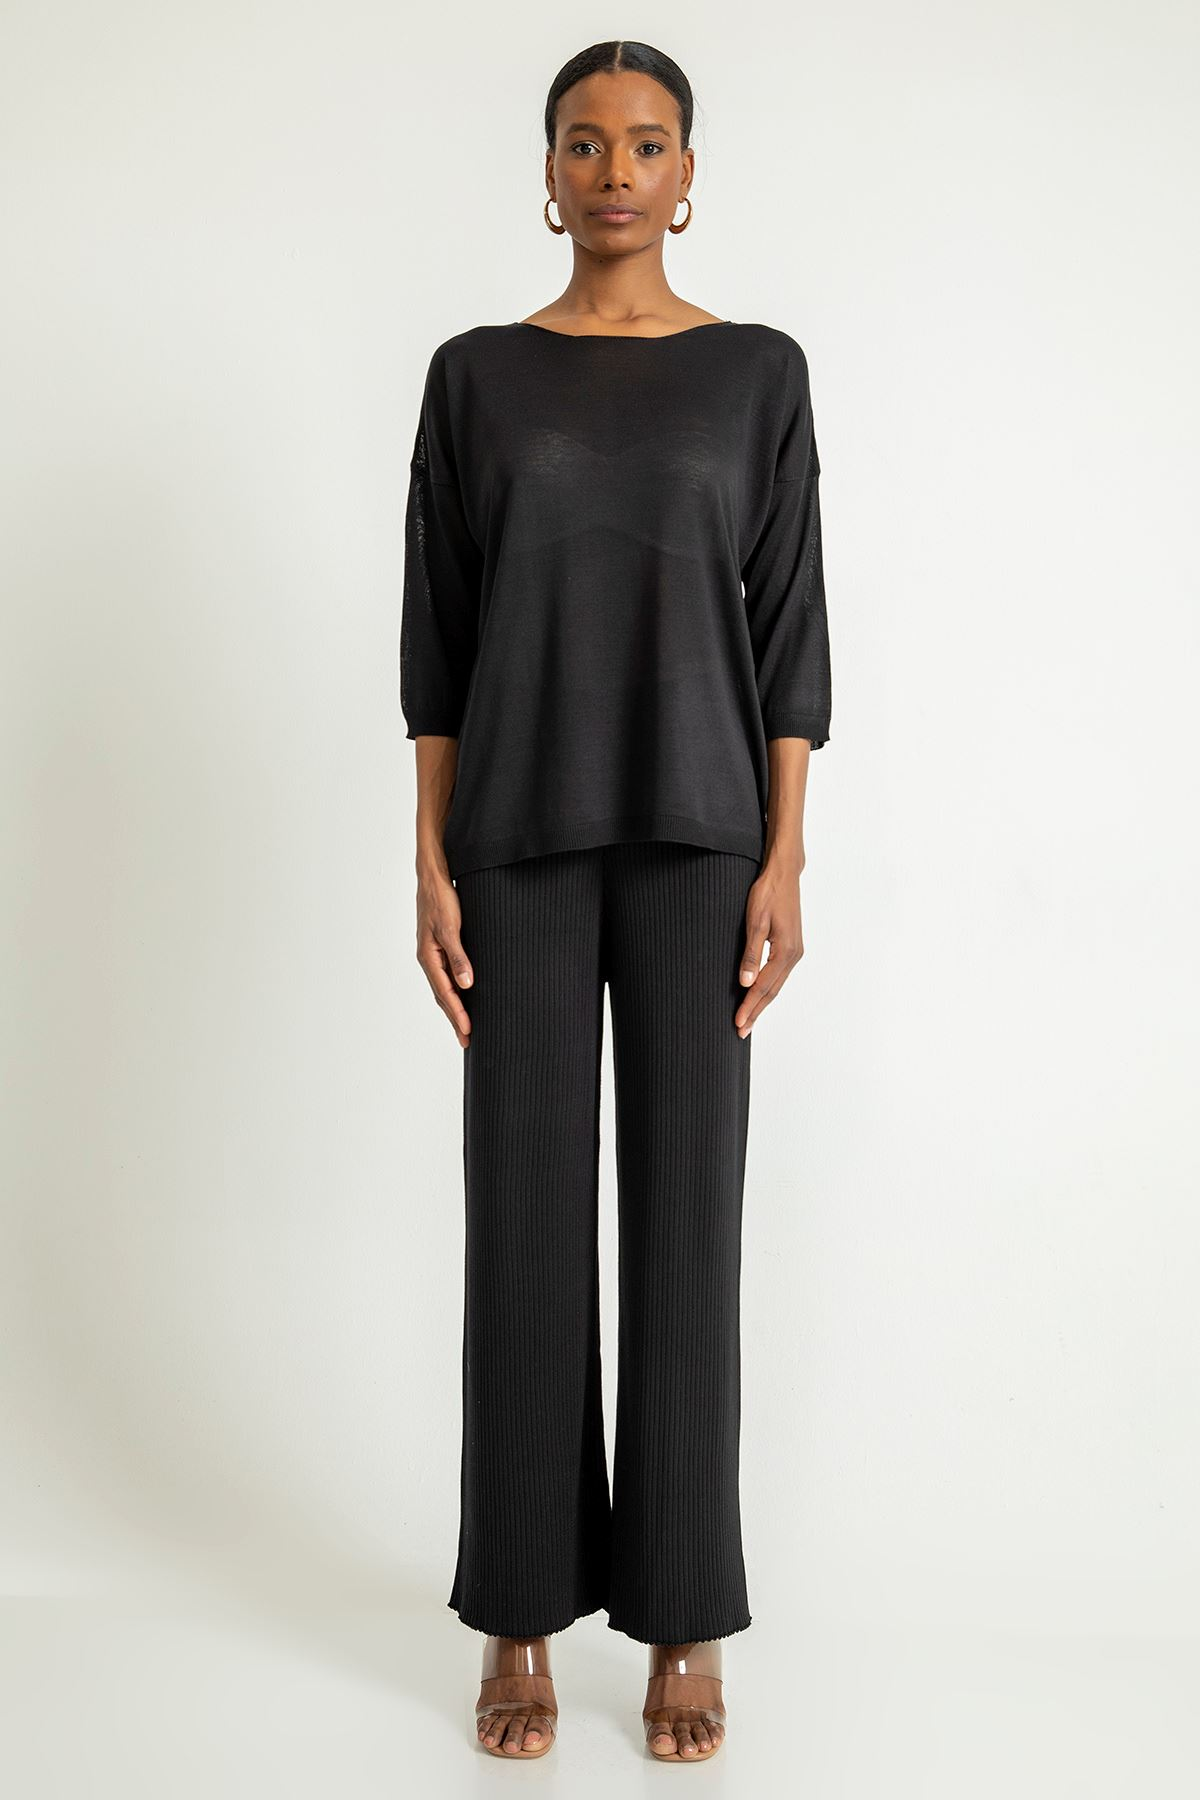 Piliseli Pantolon Takım-Siyah